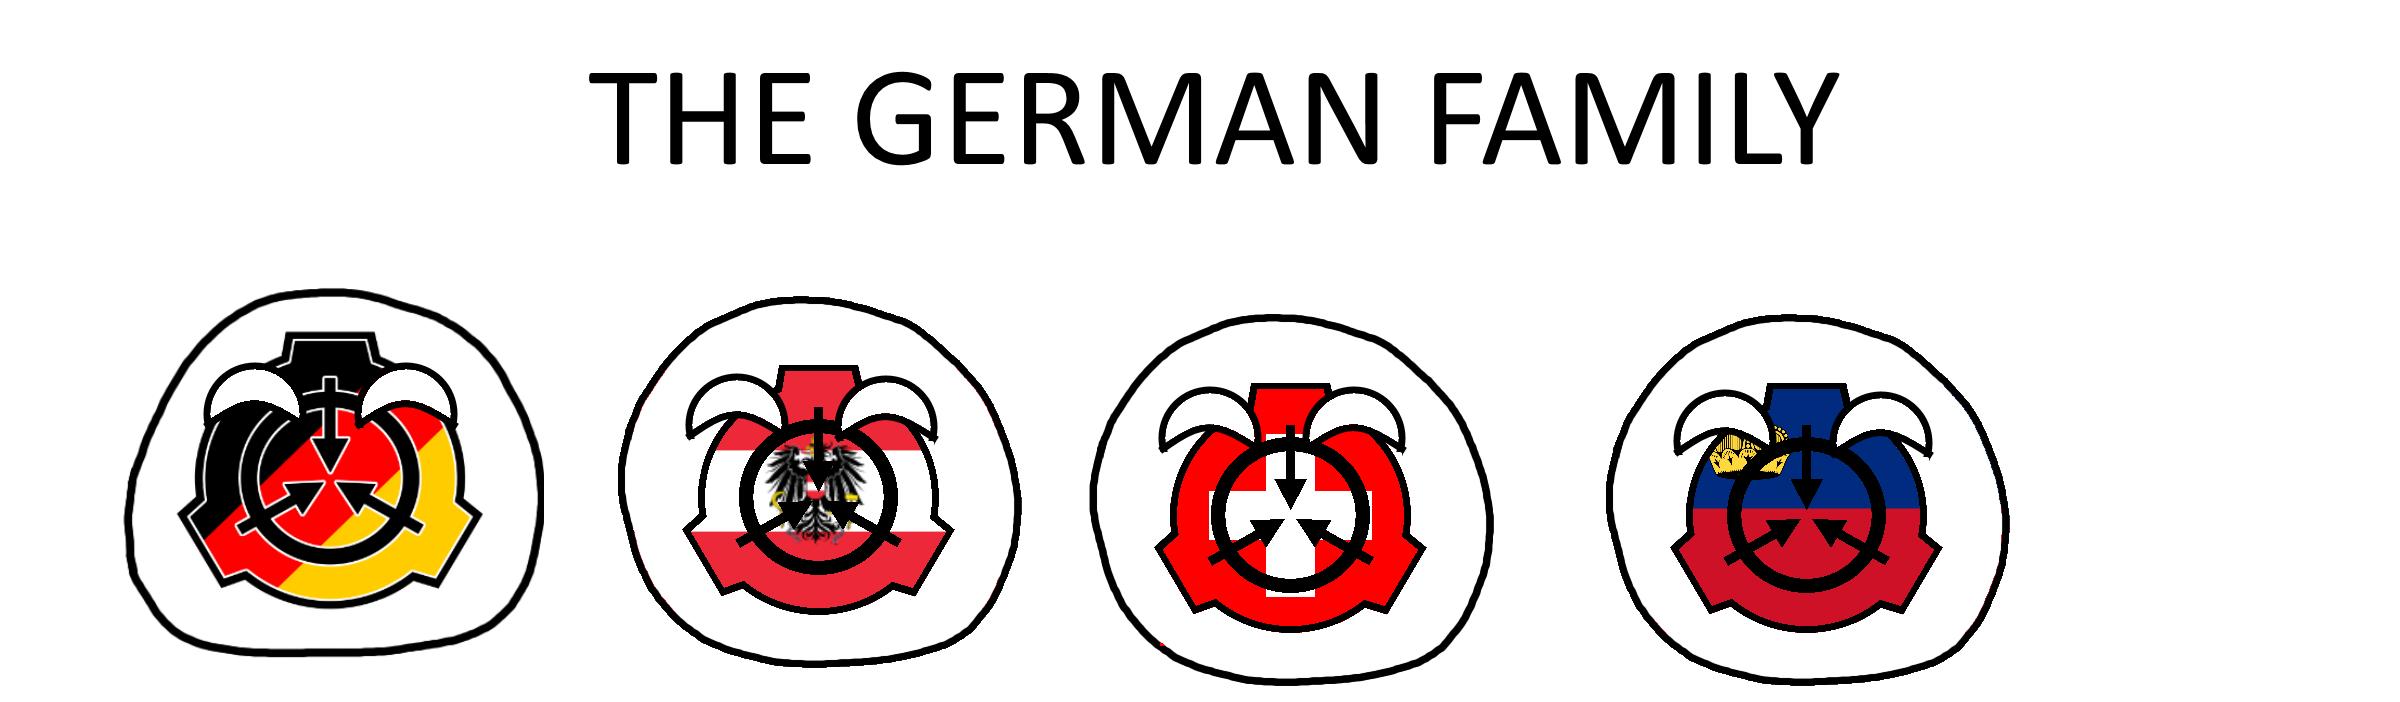 German%20Family.png